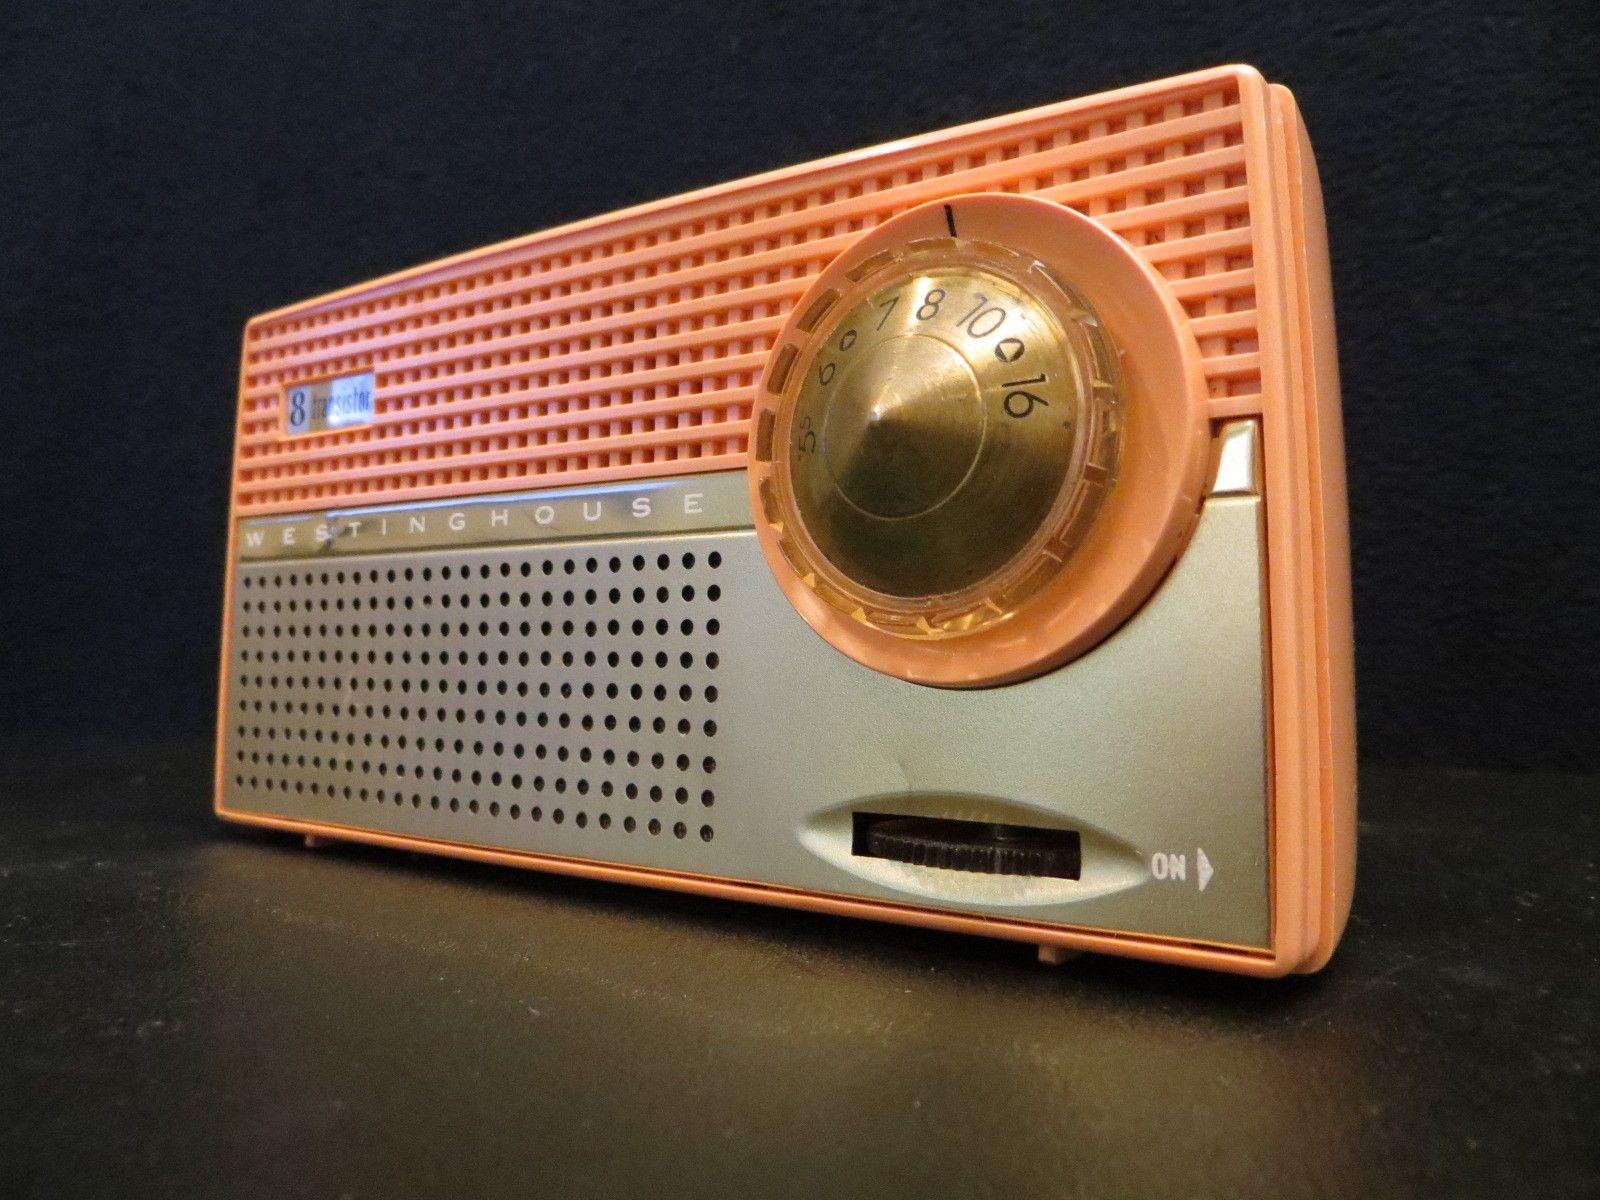 Vintage Old 1950s Pink Westinghouse Atomic Retro Antique Transistor Radio Transistor Radio Vintage Radio Antique Radio